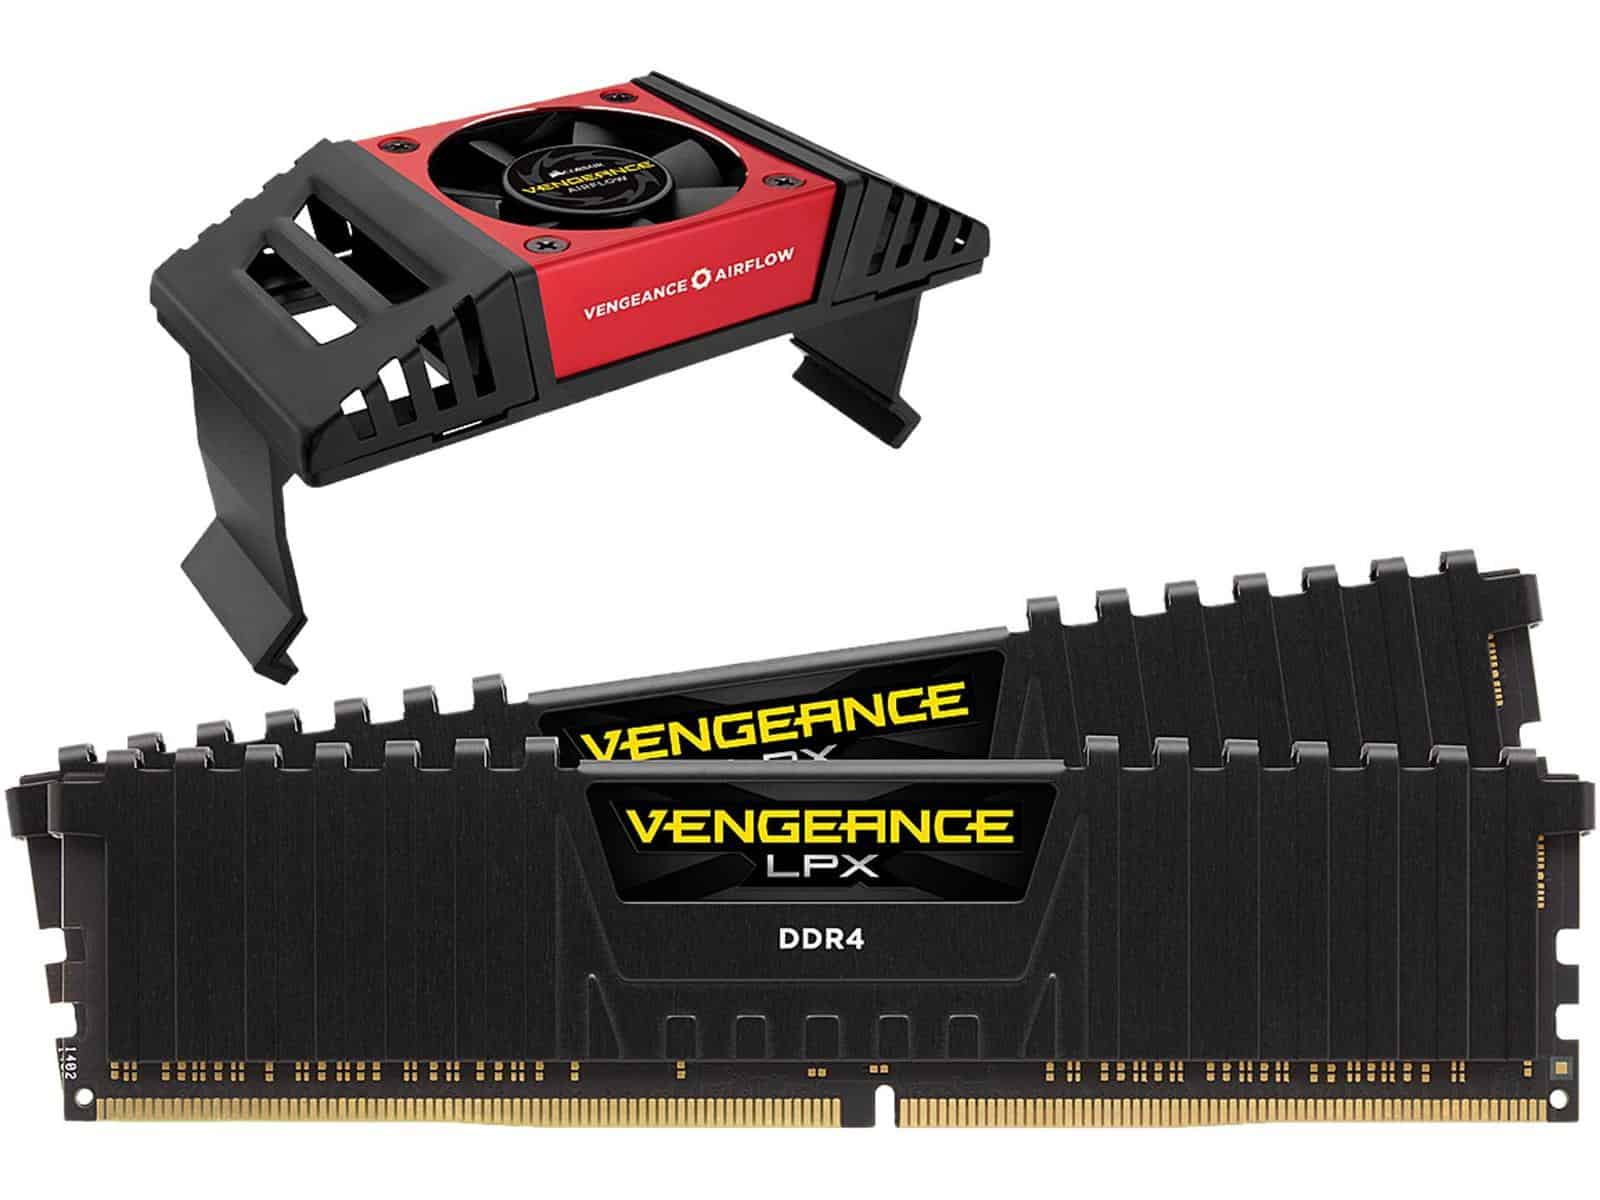 Corsair Vengeance LPX 16GB (2 x 8GB) DDR4-4266 Black